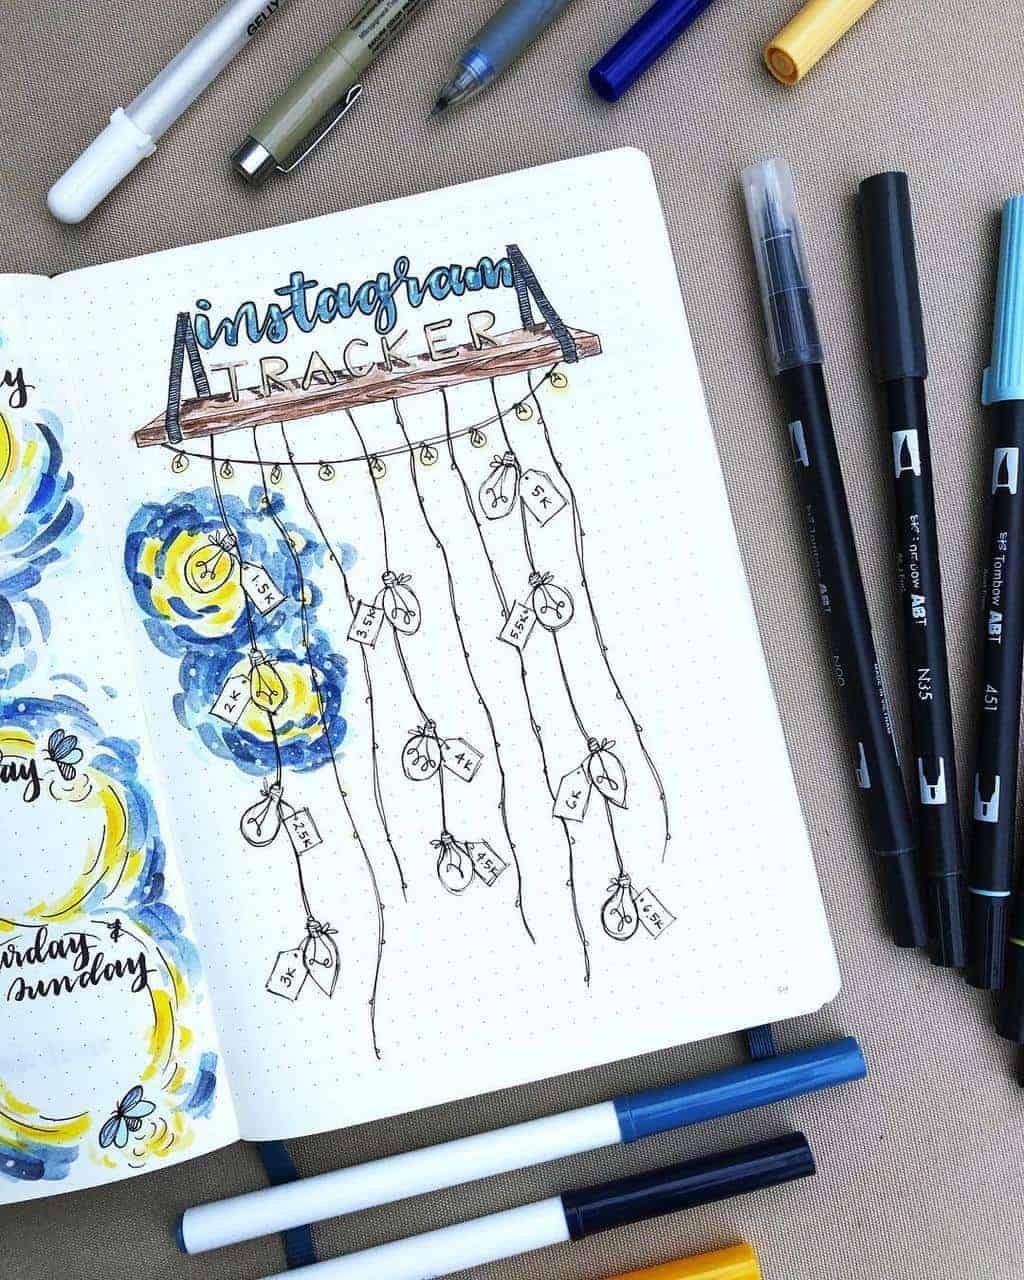 Fireflies Bullet Journal Theme Inspirations - tracker by @paperflight.v | Masha Plans